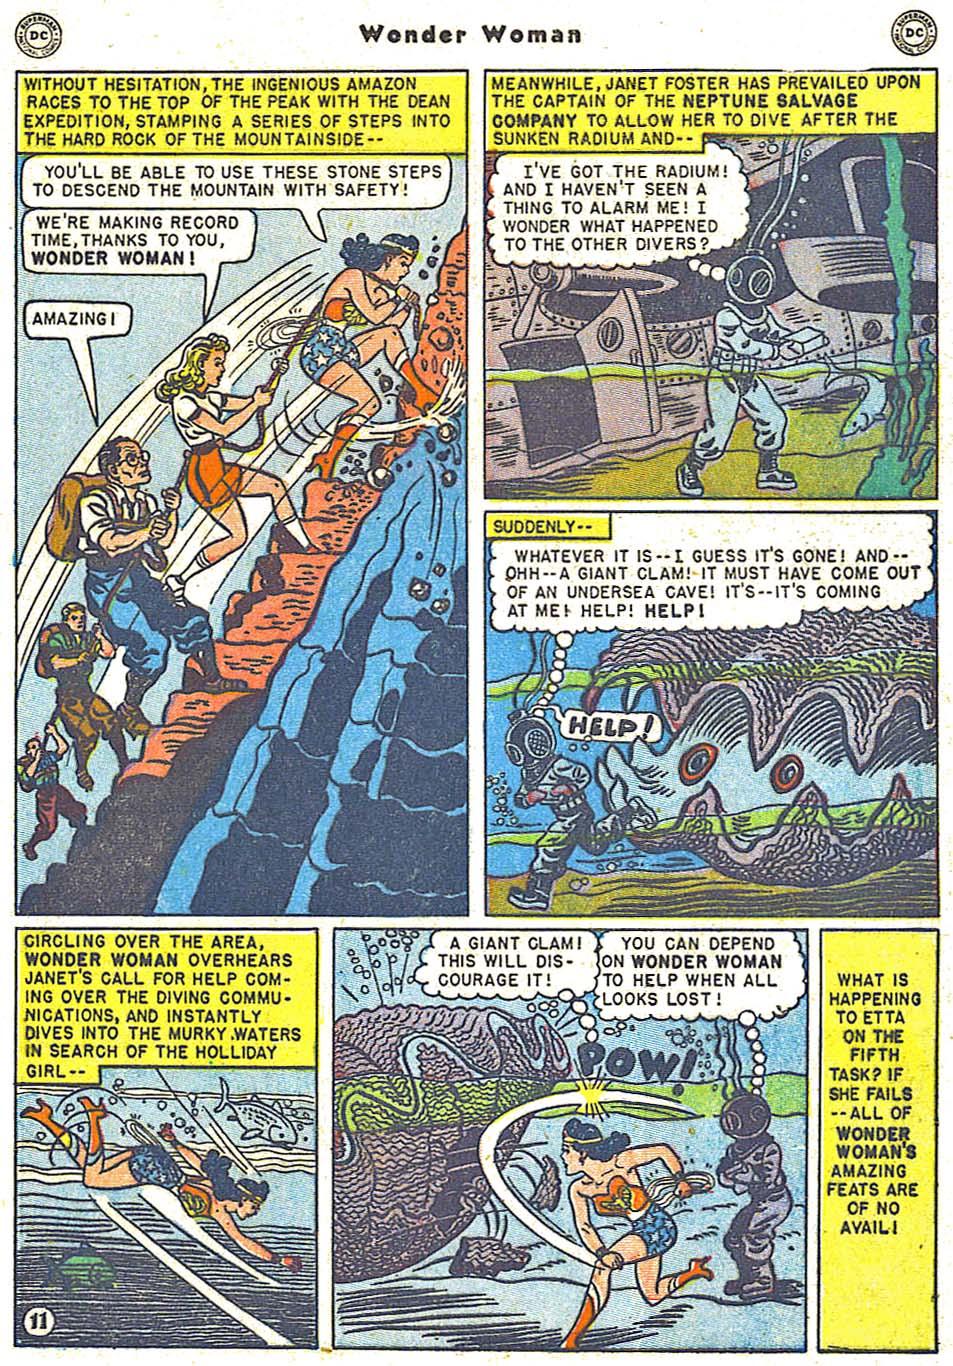 Read online Wonder Woman (1942) comic -  Issue #38 - 47